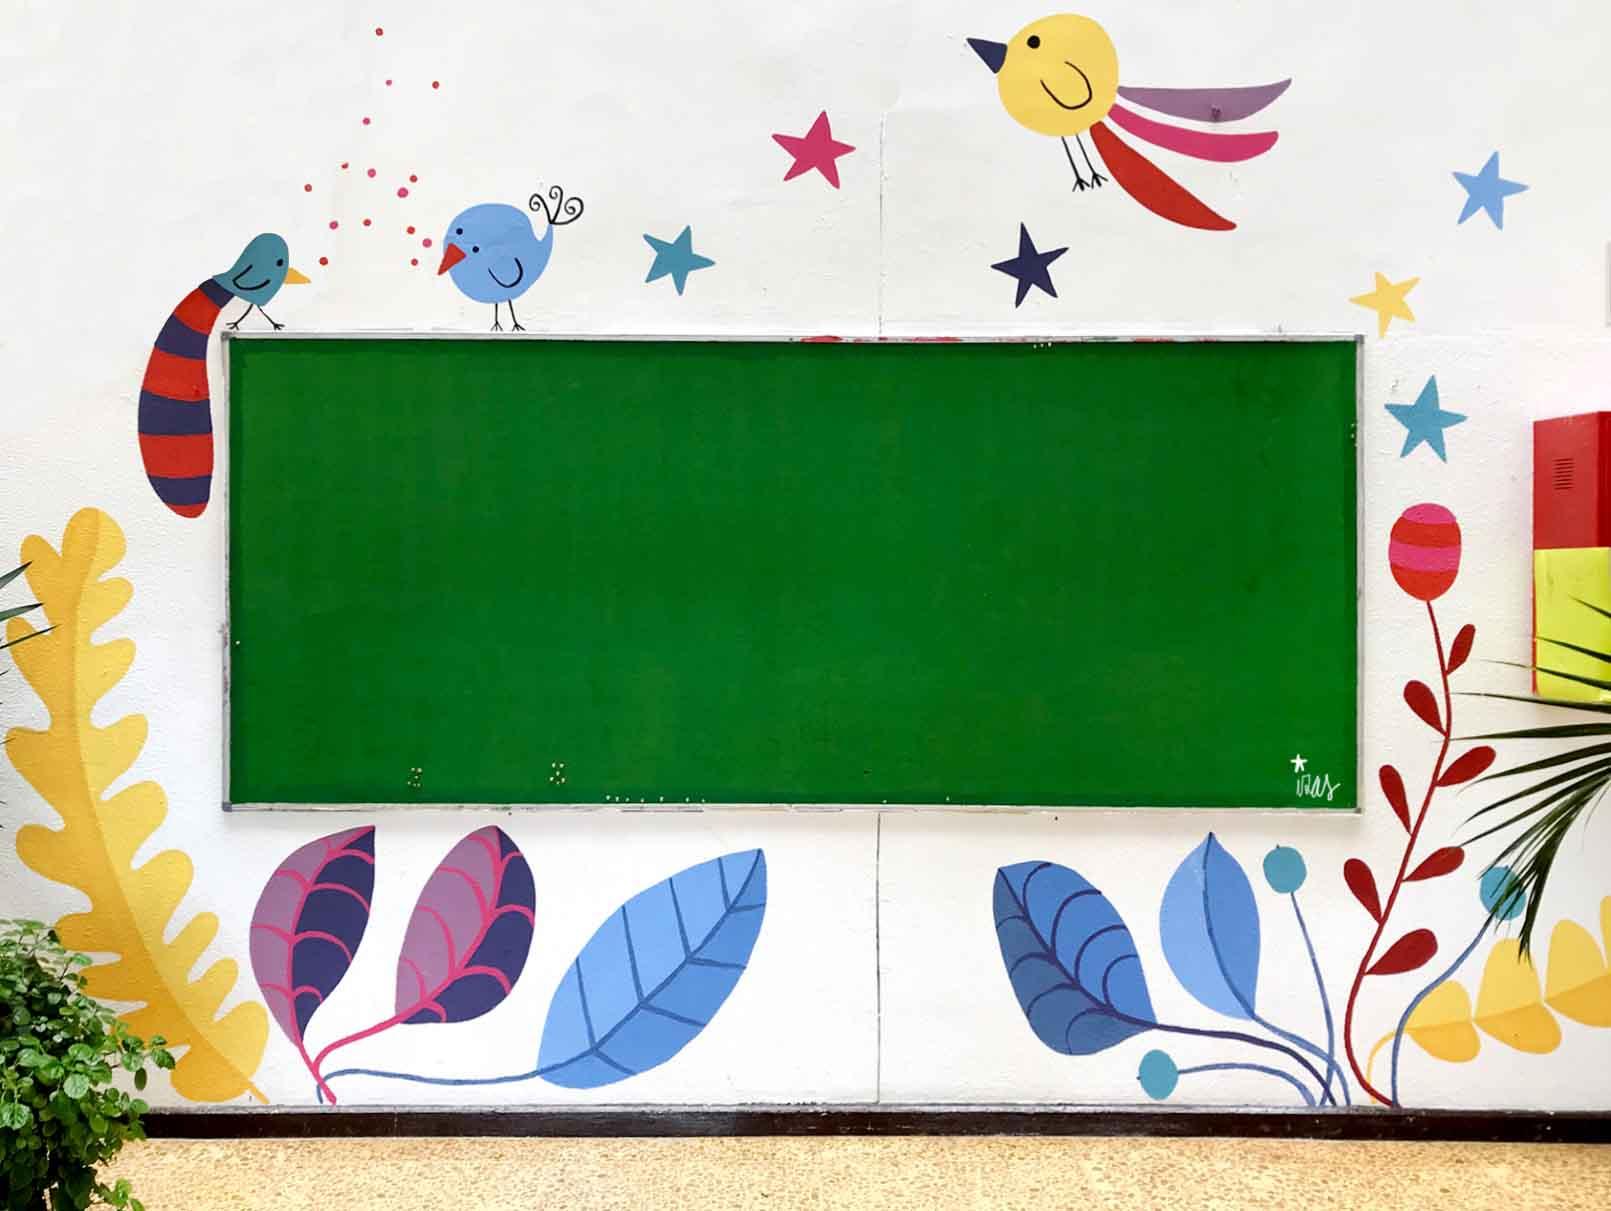 mural izas gerardo diego interior 3